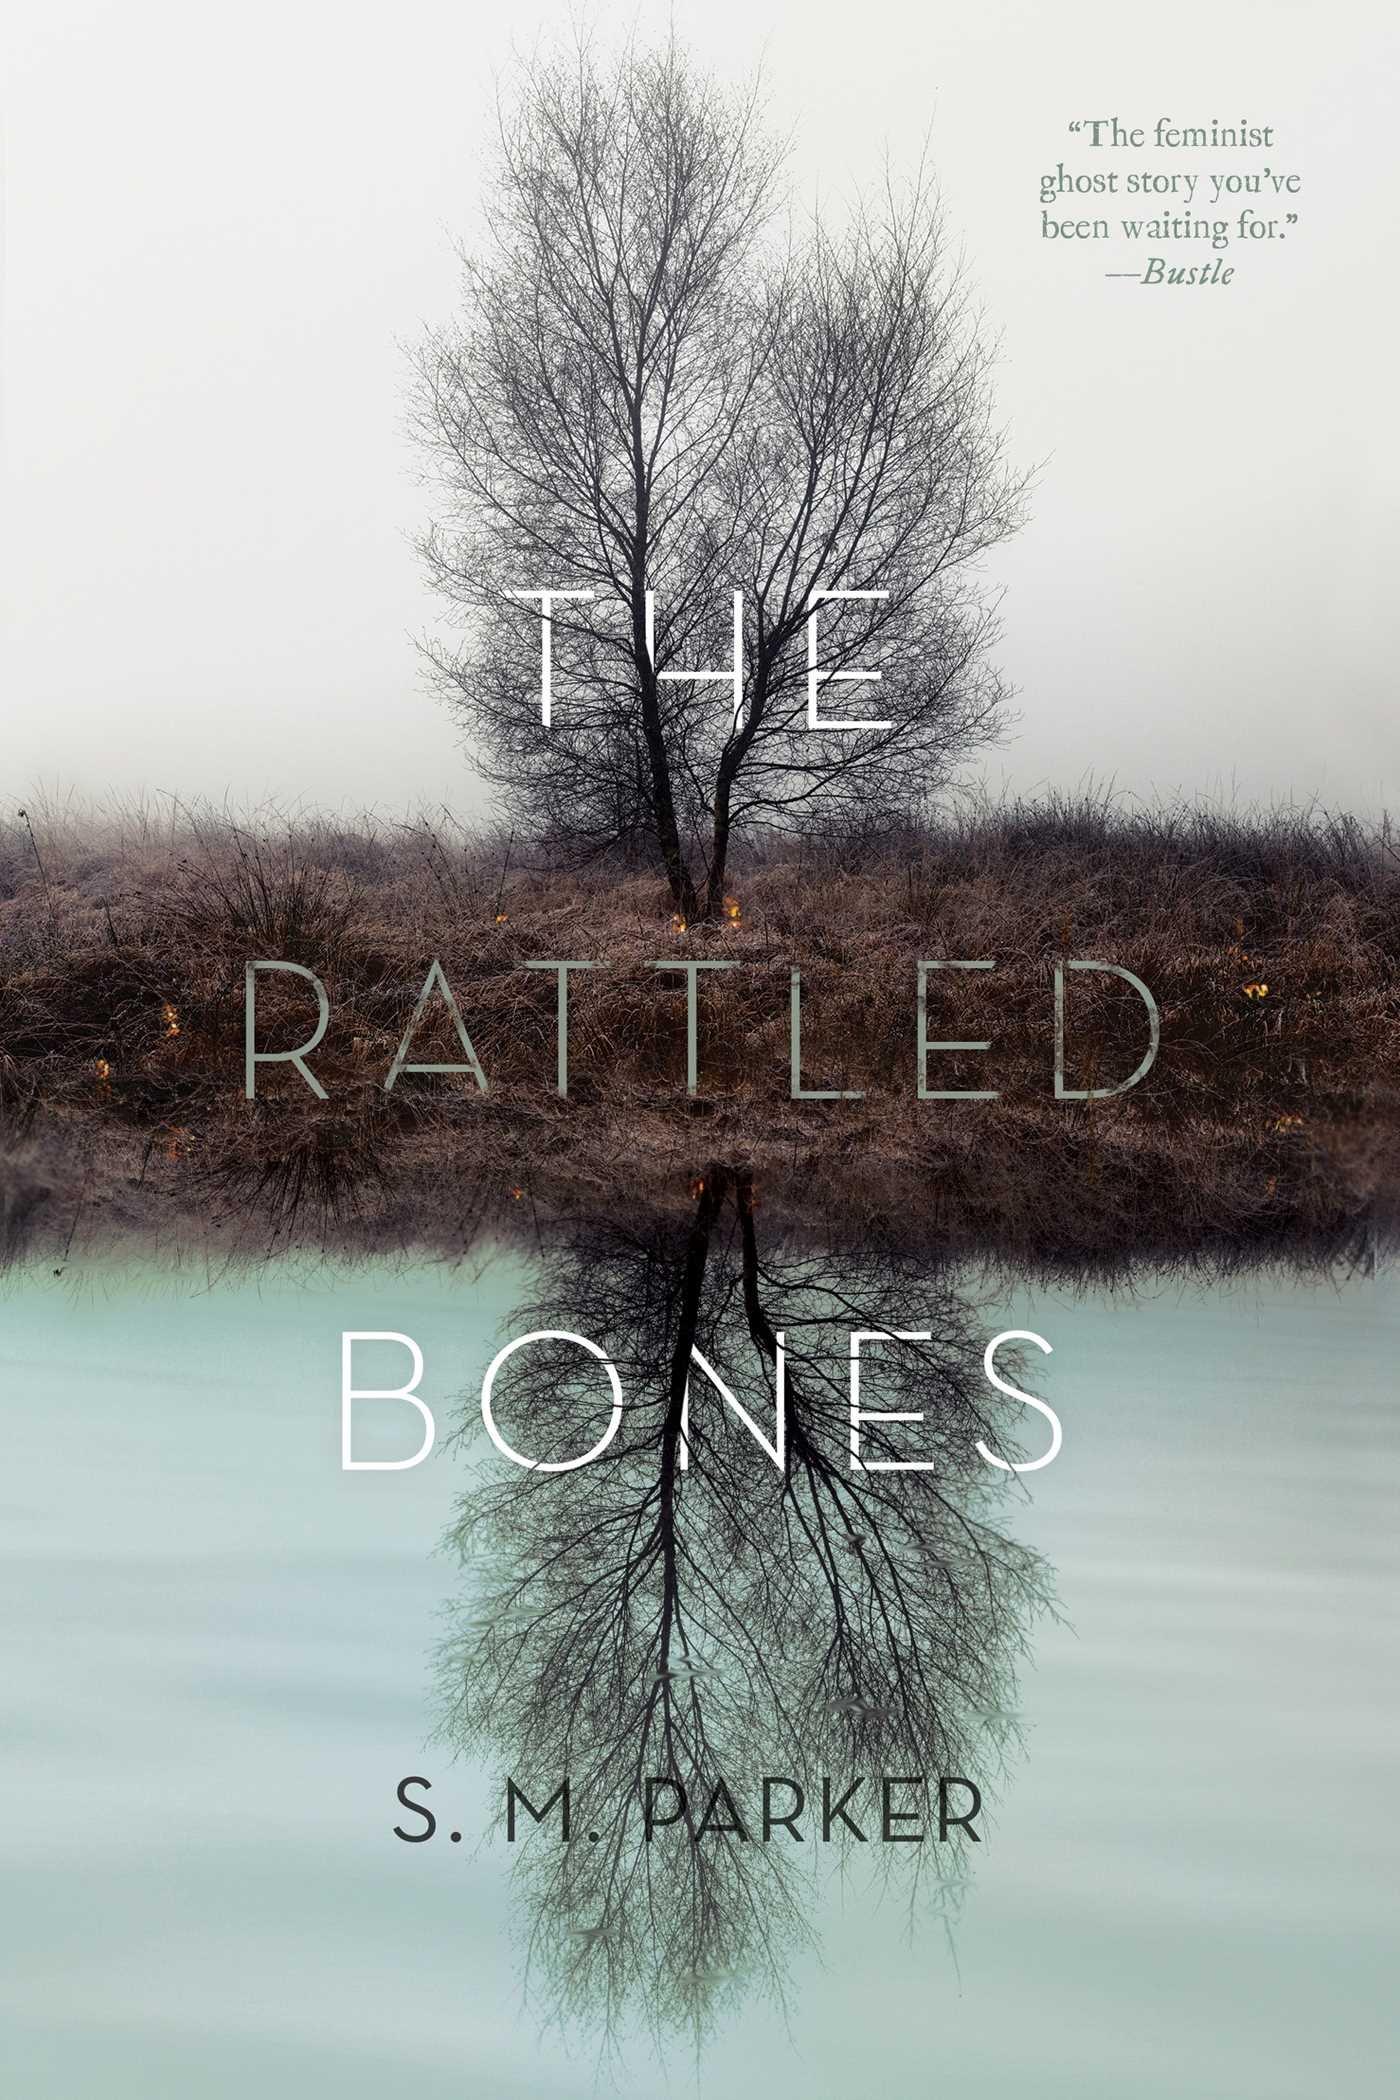 Download The Rattled Bones PDF